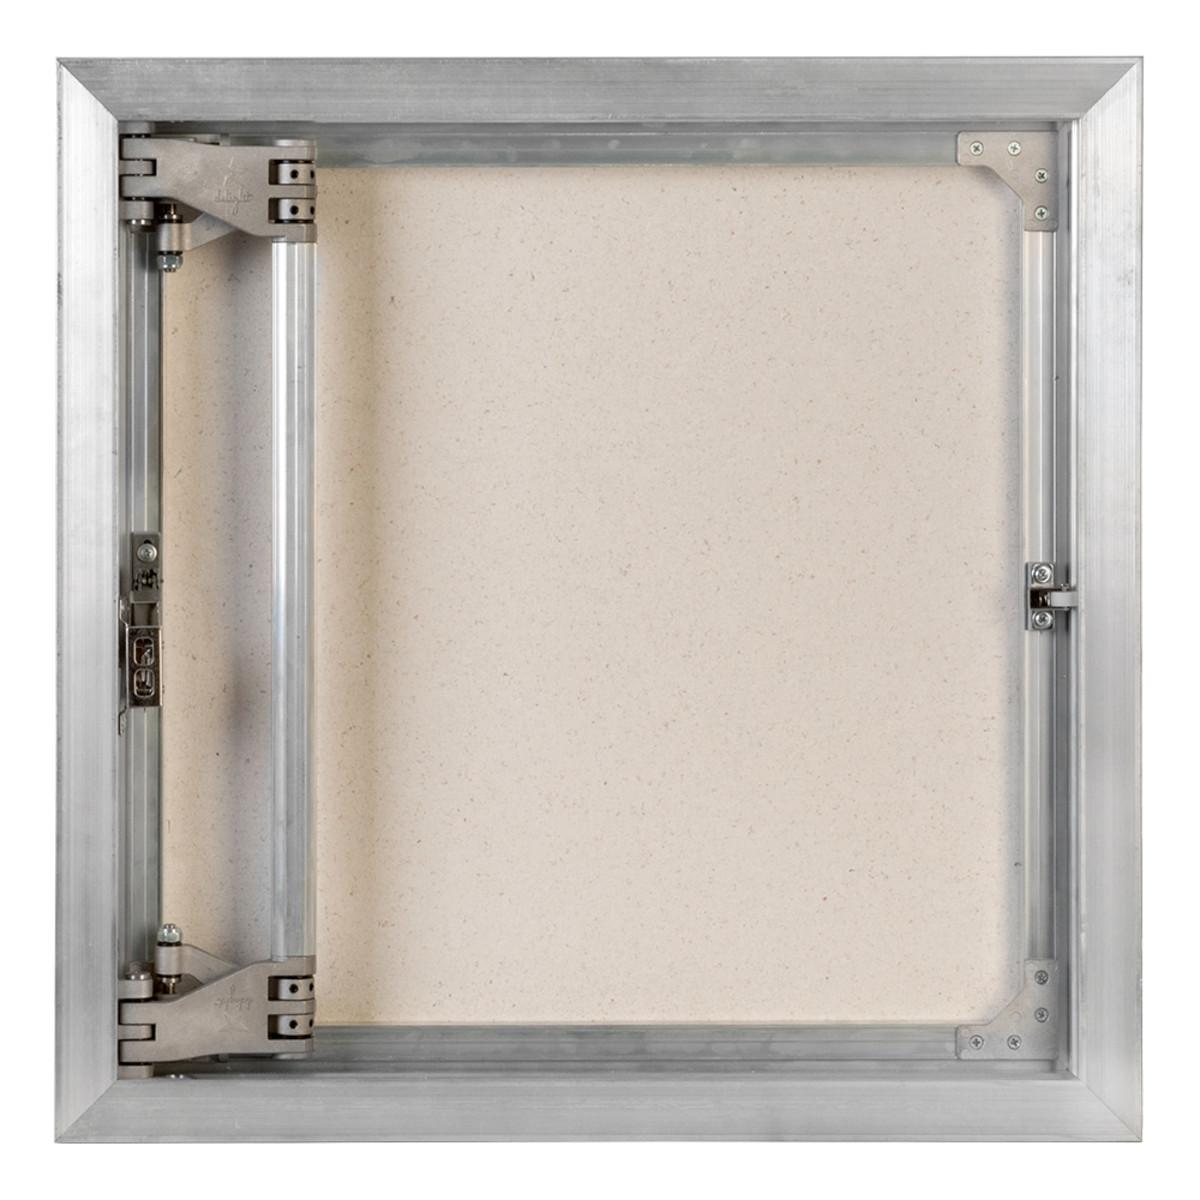 Люк ревизионный АРРЗ-Премиум 40х40Х см алюминиевый